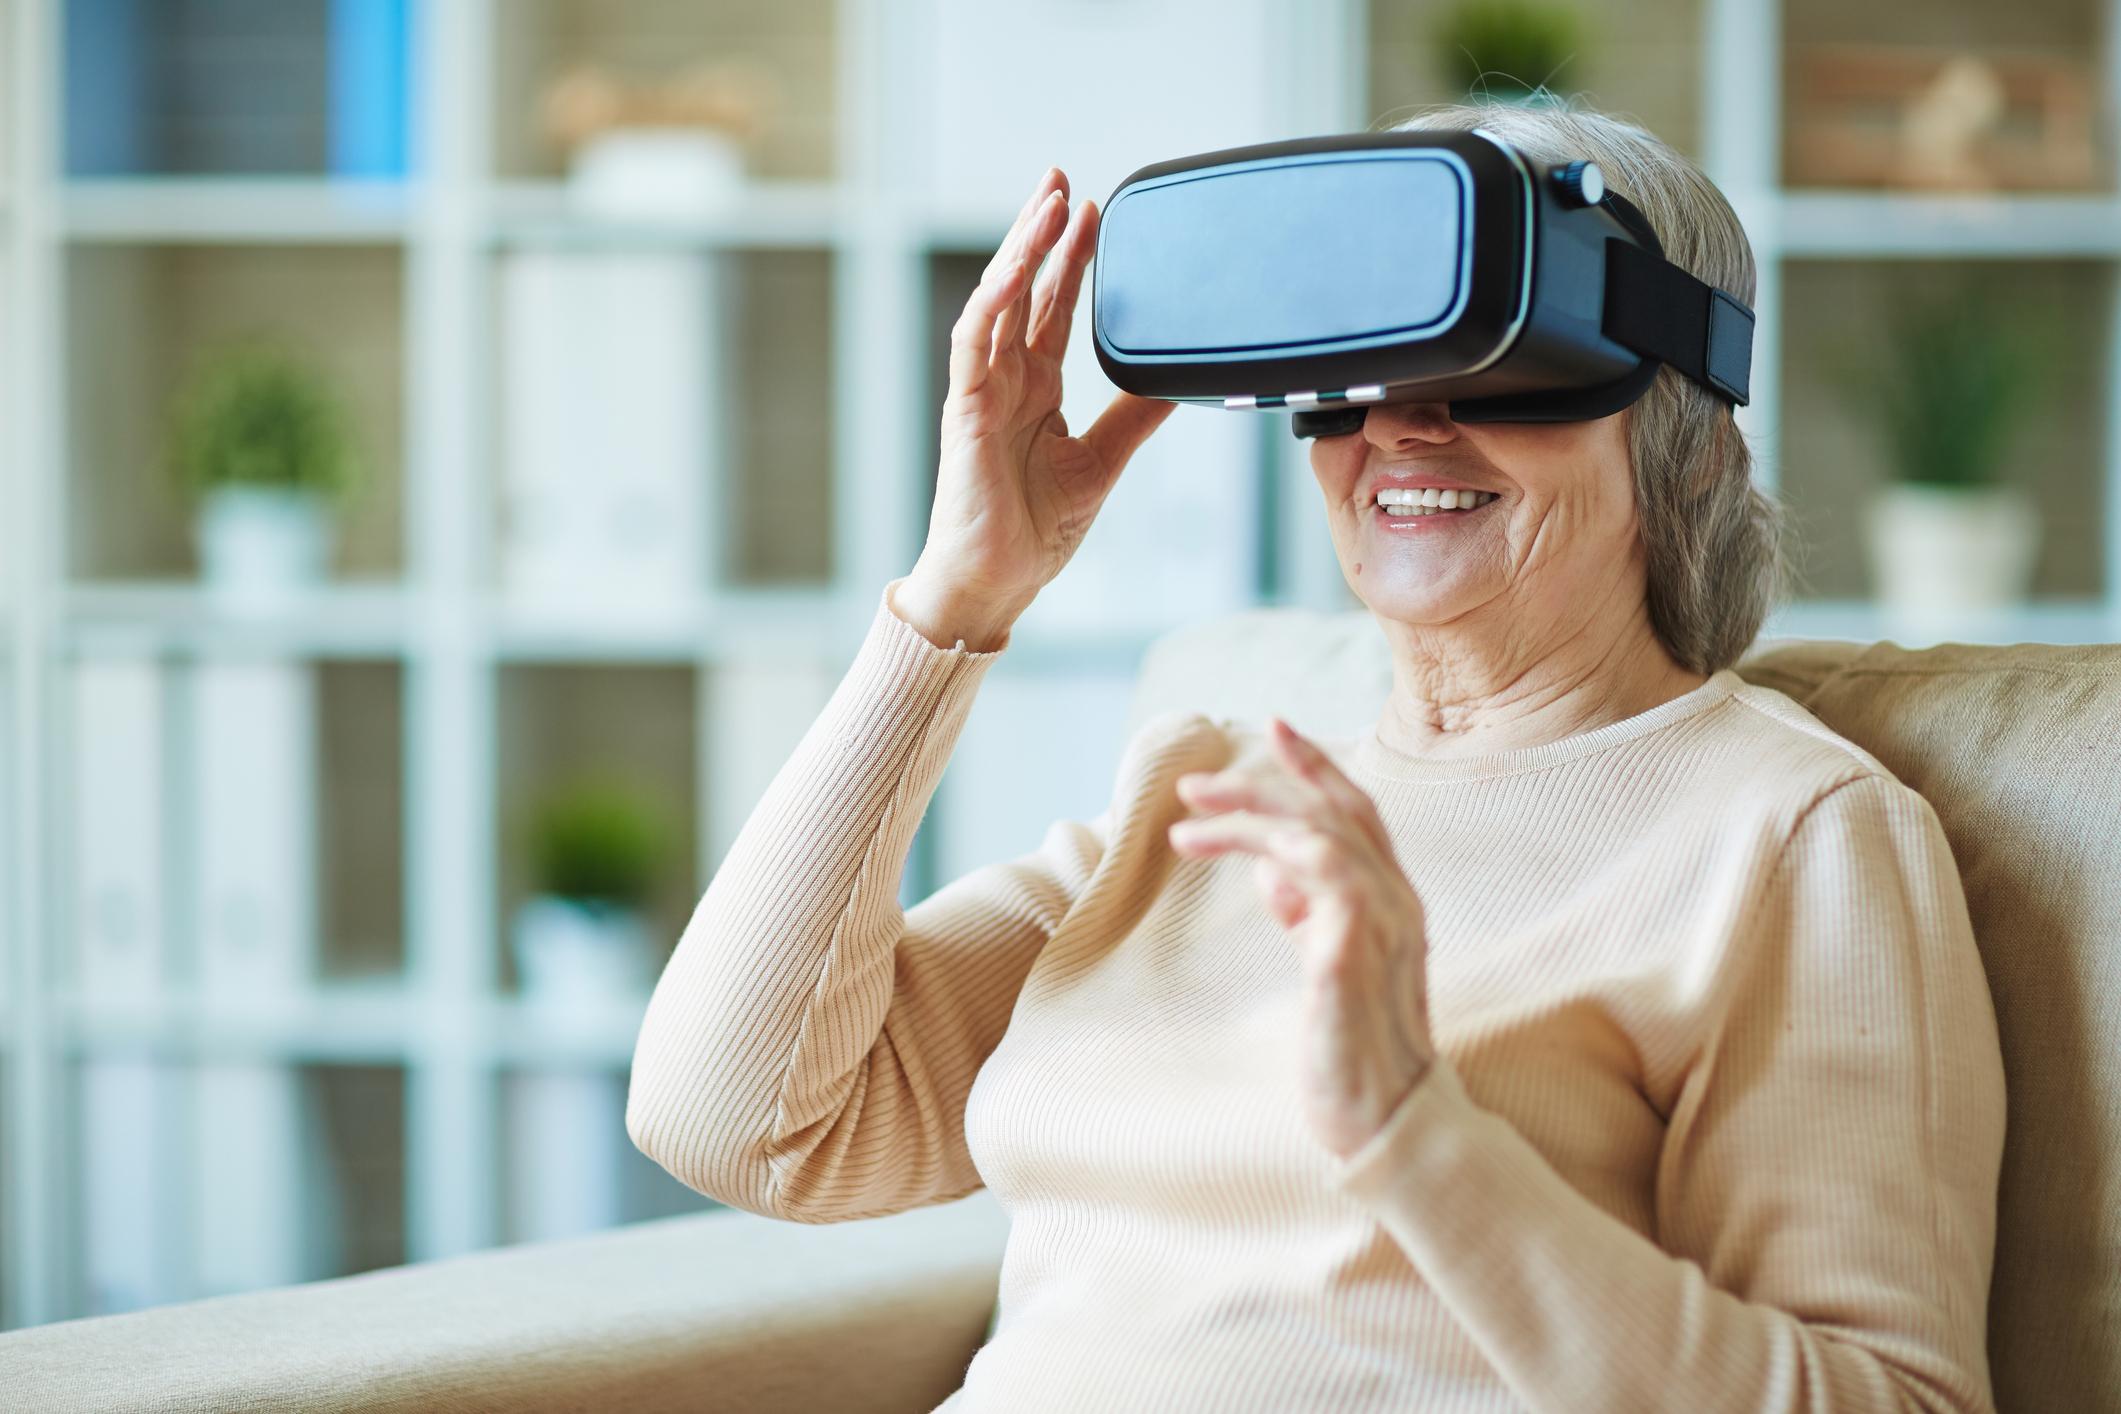 Granny avec la technologie moderne